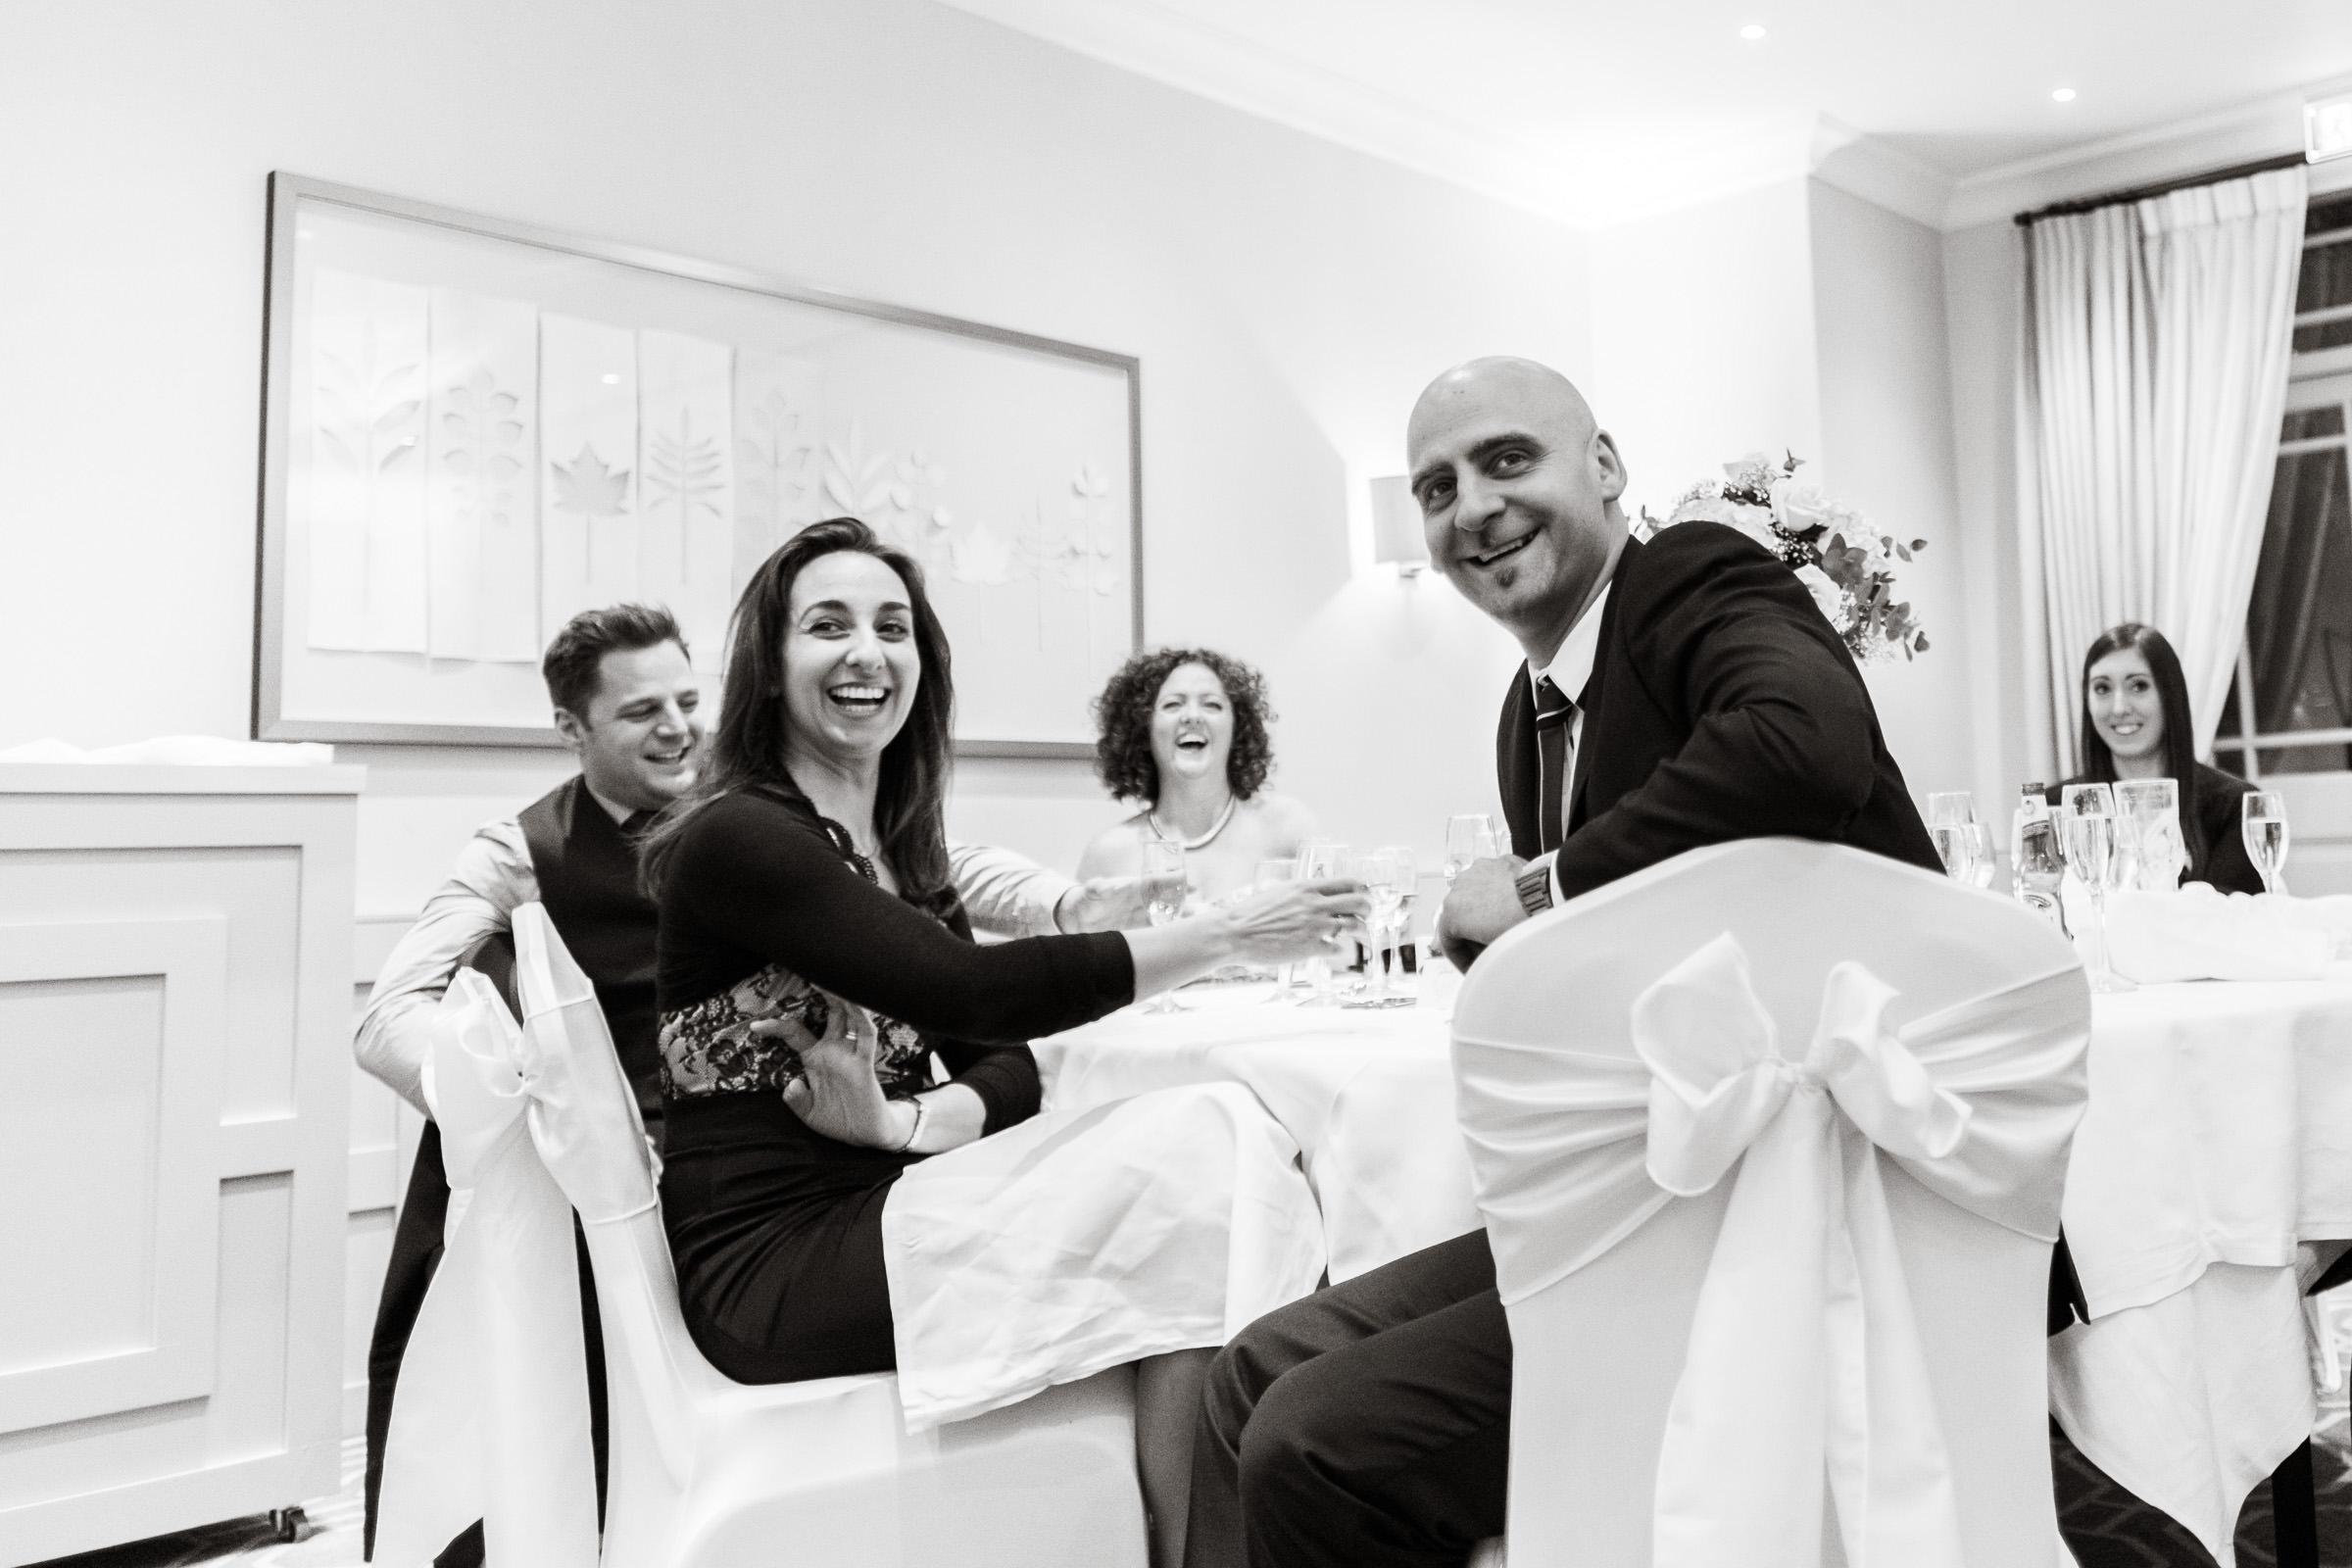 Donna & Nick's Wedding at Wotton House in Dorking 023.jpg